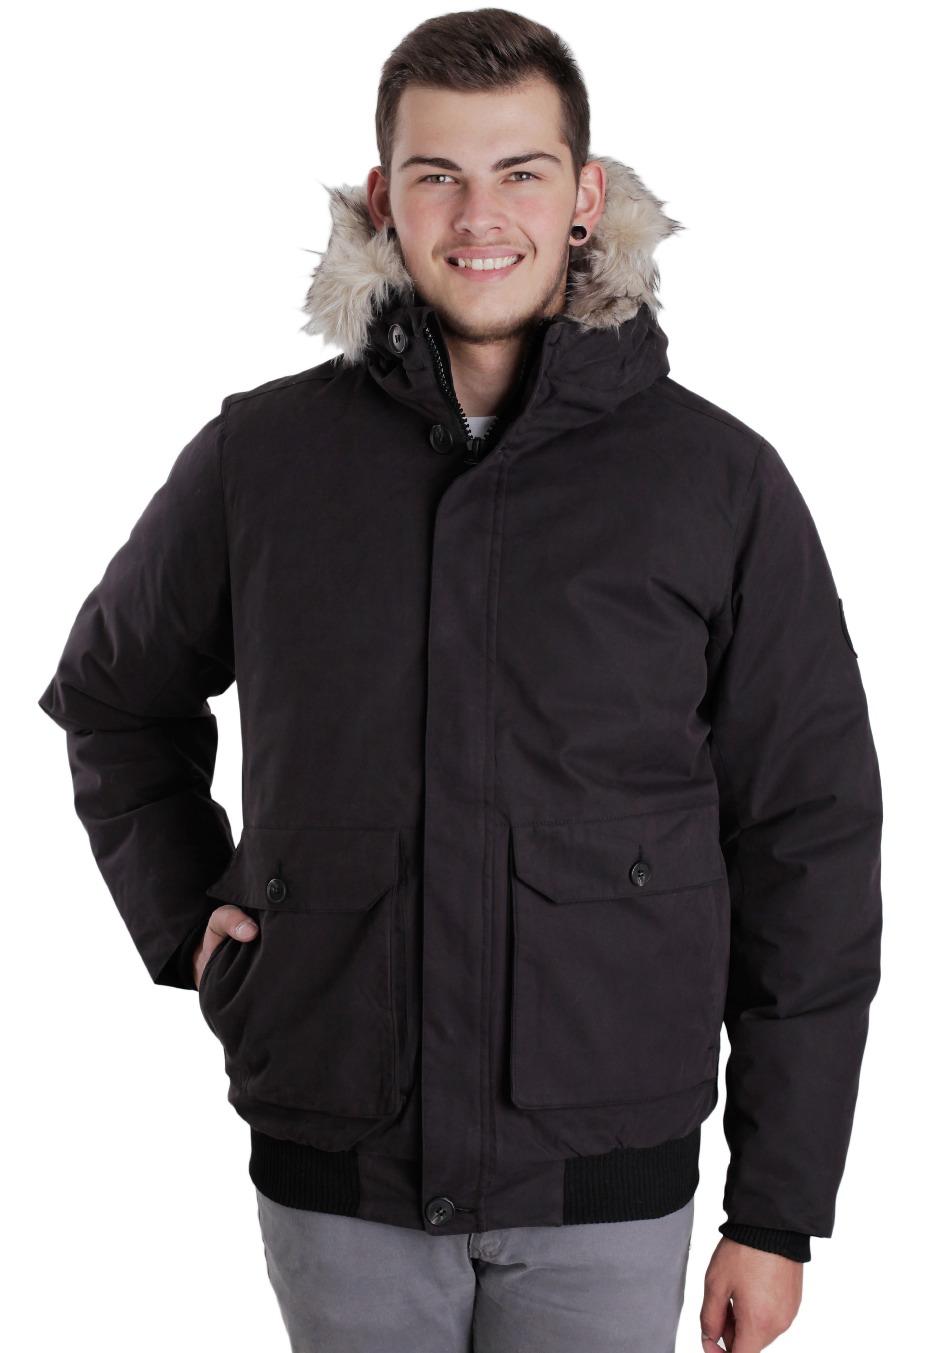 Mazine - Aspen - Bunda - Streetwear obchod - Impericon.com CZ SK 1abacb3d76